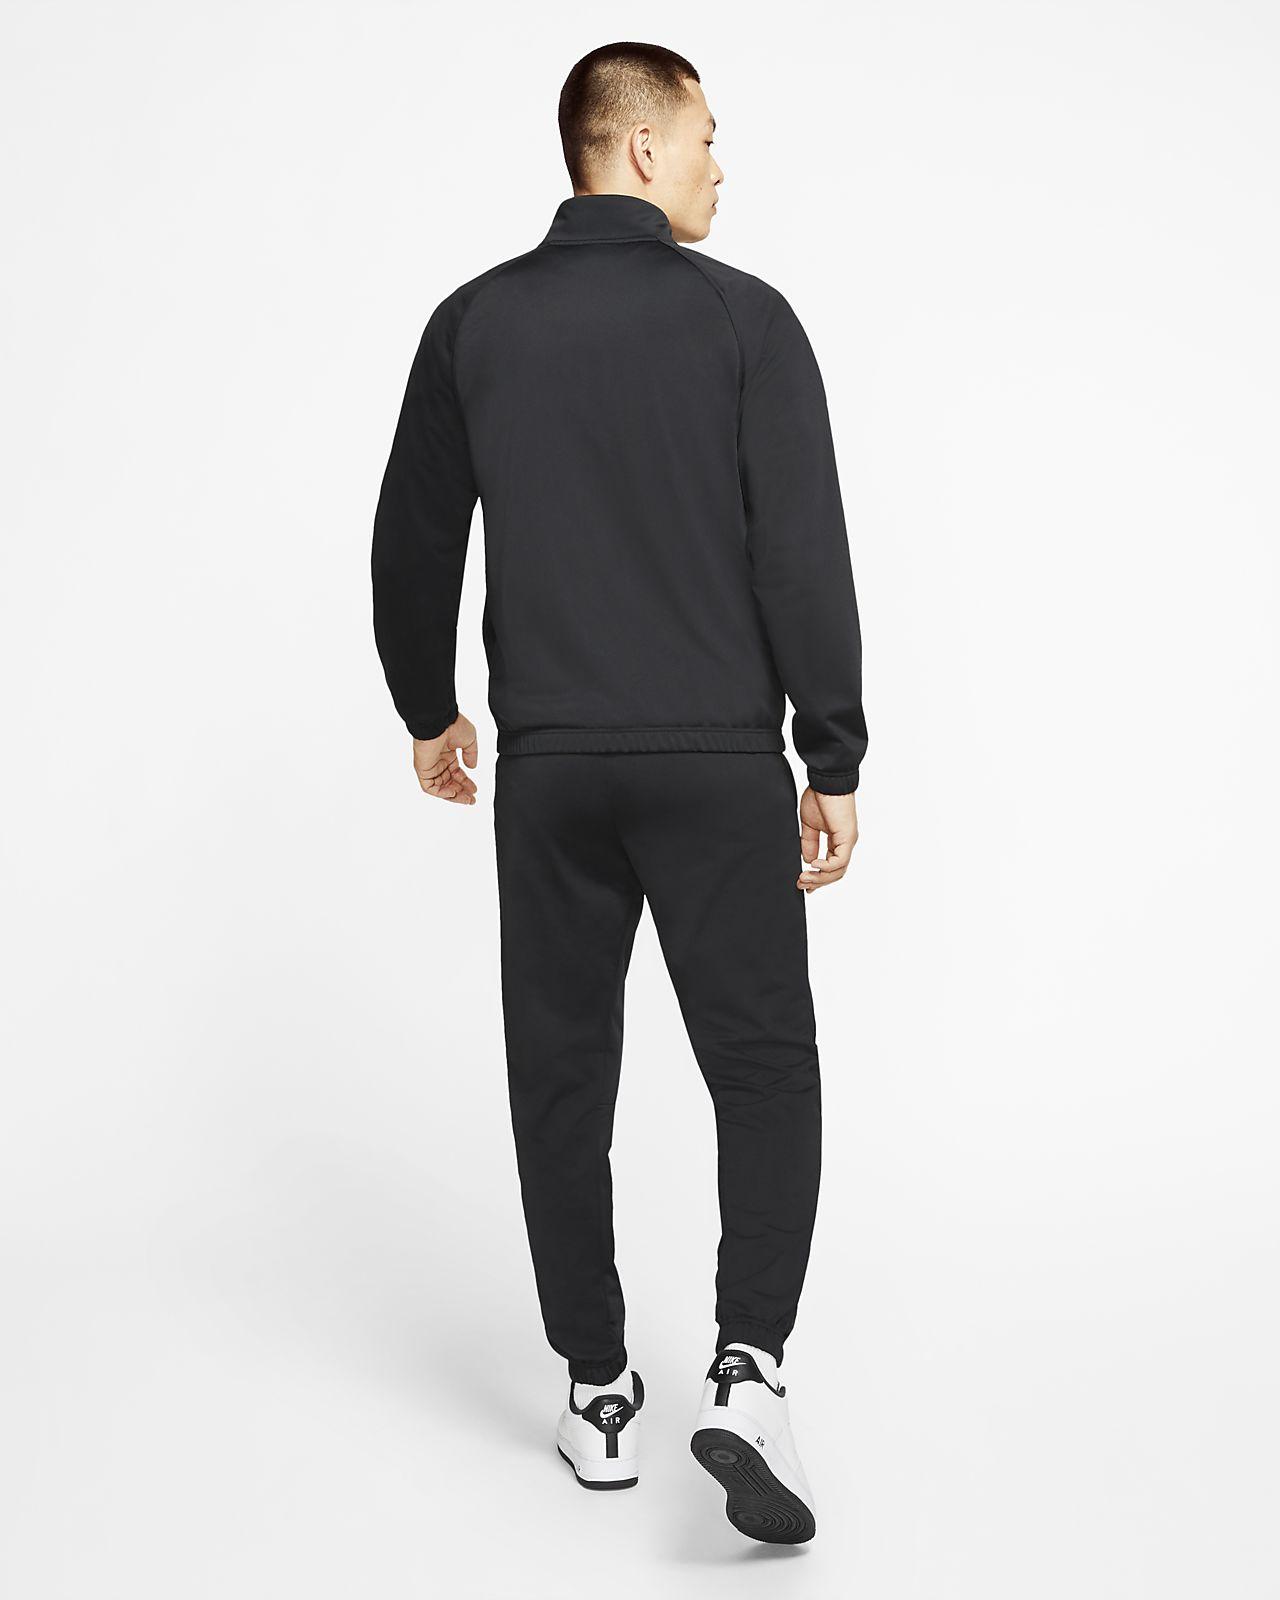 Tuta Nike Sportswear Uomo